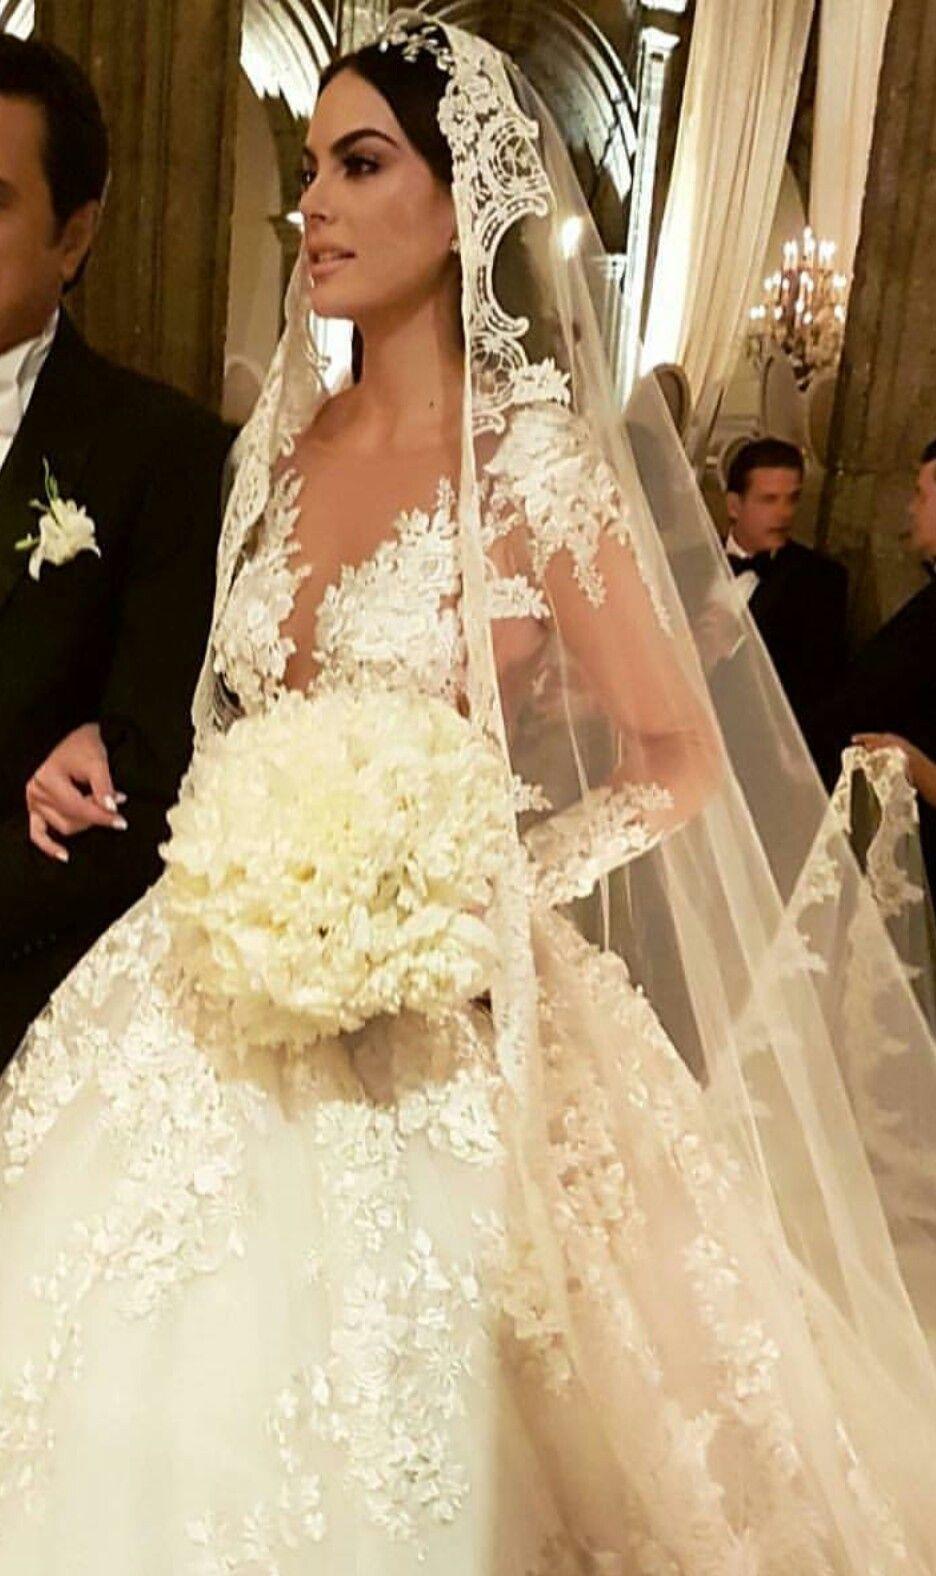 Ximena Navarrete Bride In 2019 Wedding Bride Dream